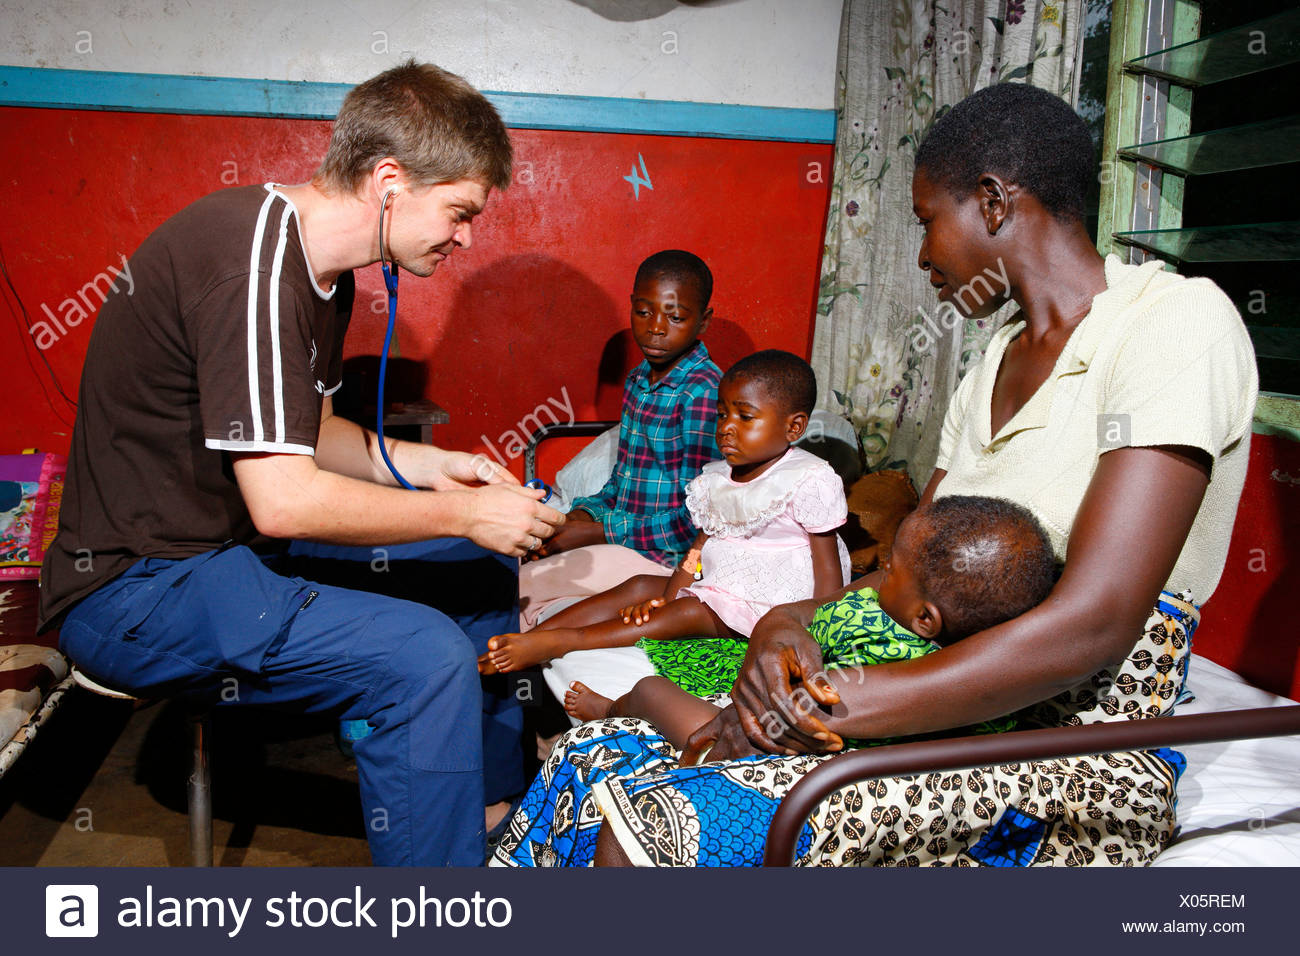 Doctors examining children, ward round in the children's ward, hospital, Manyemen, Cameroon, Africa - Stock Image